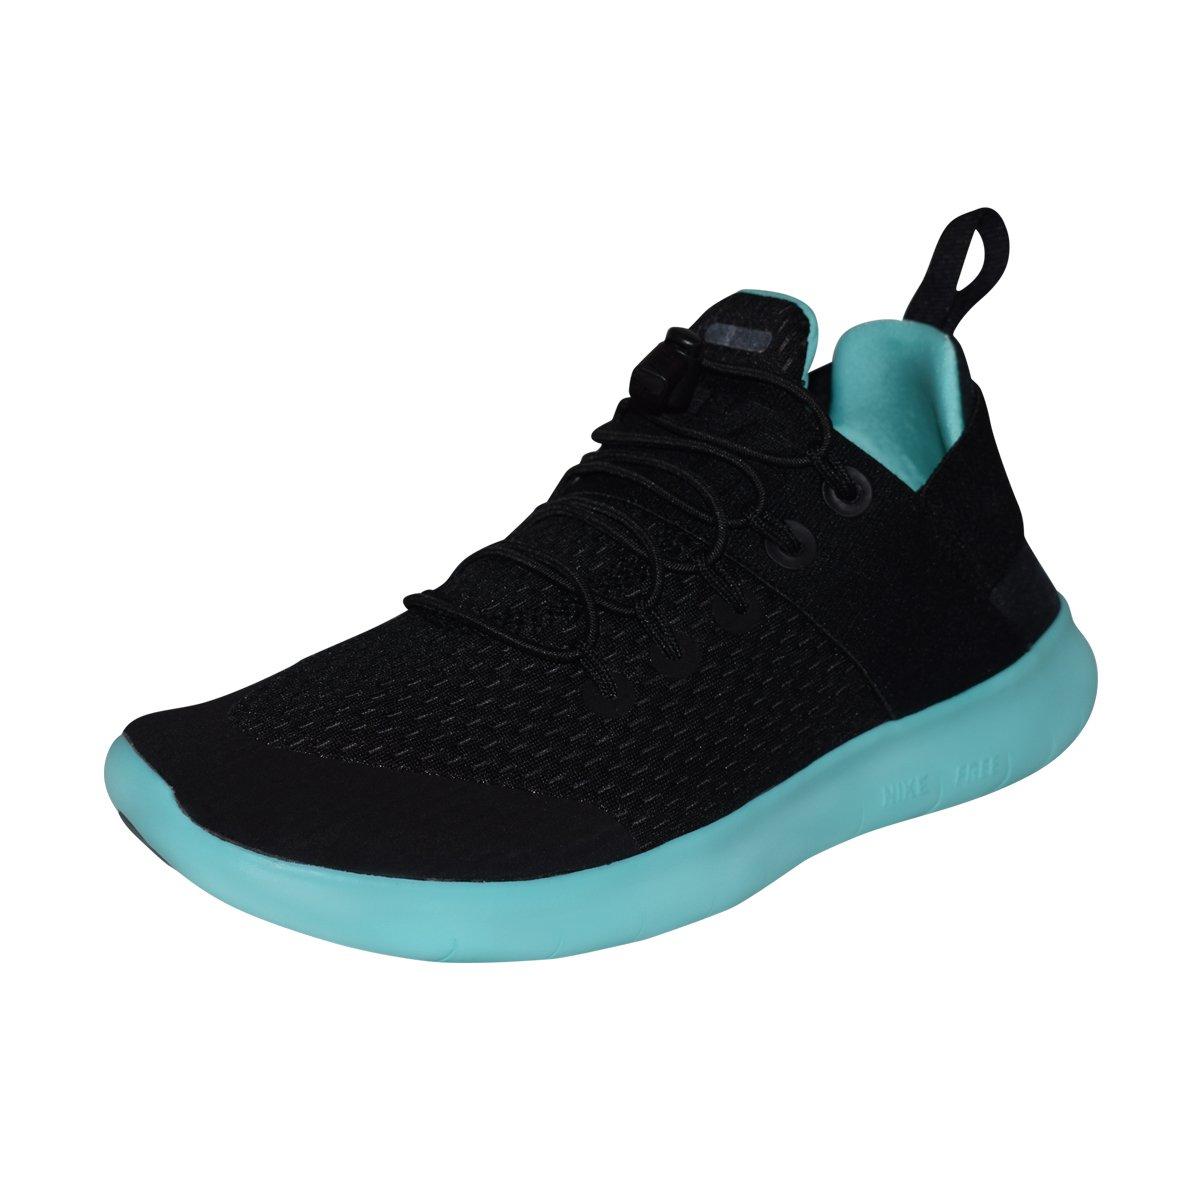 NIKE Women's Free RN CMTR 2017 Running Shoe B07CF86G73 11 B(M) US|Black/Aurora